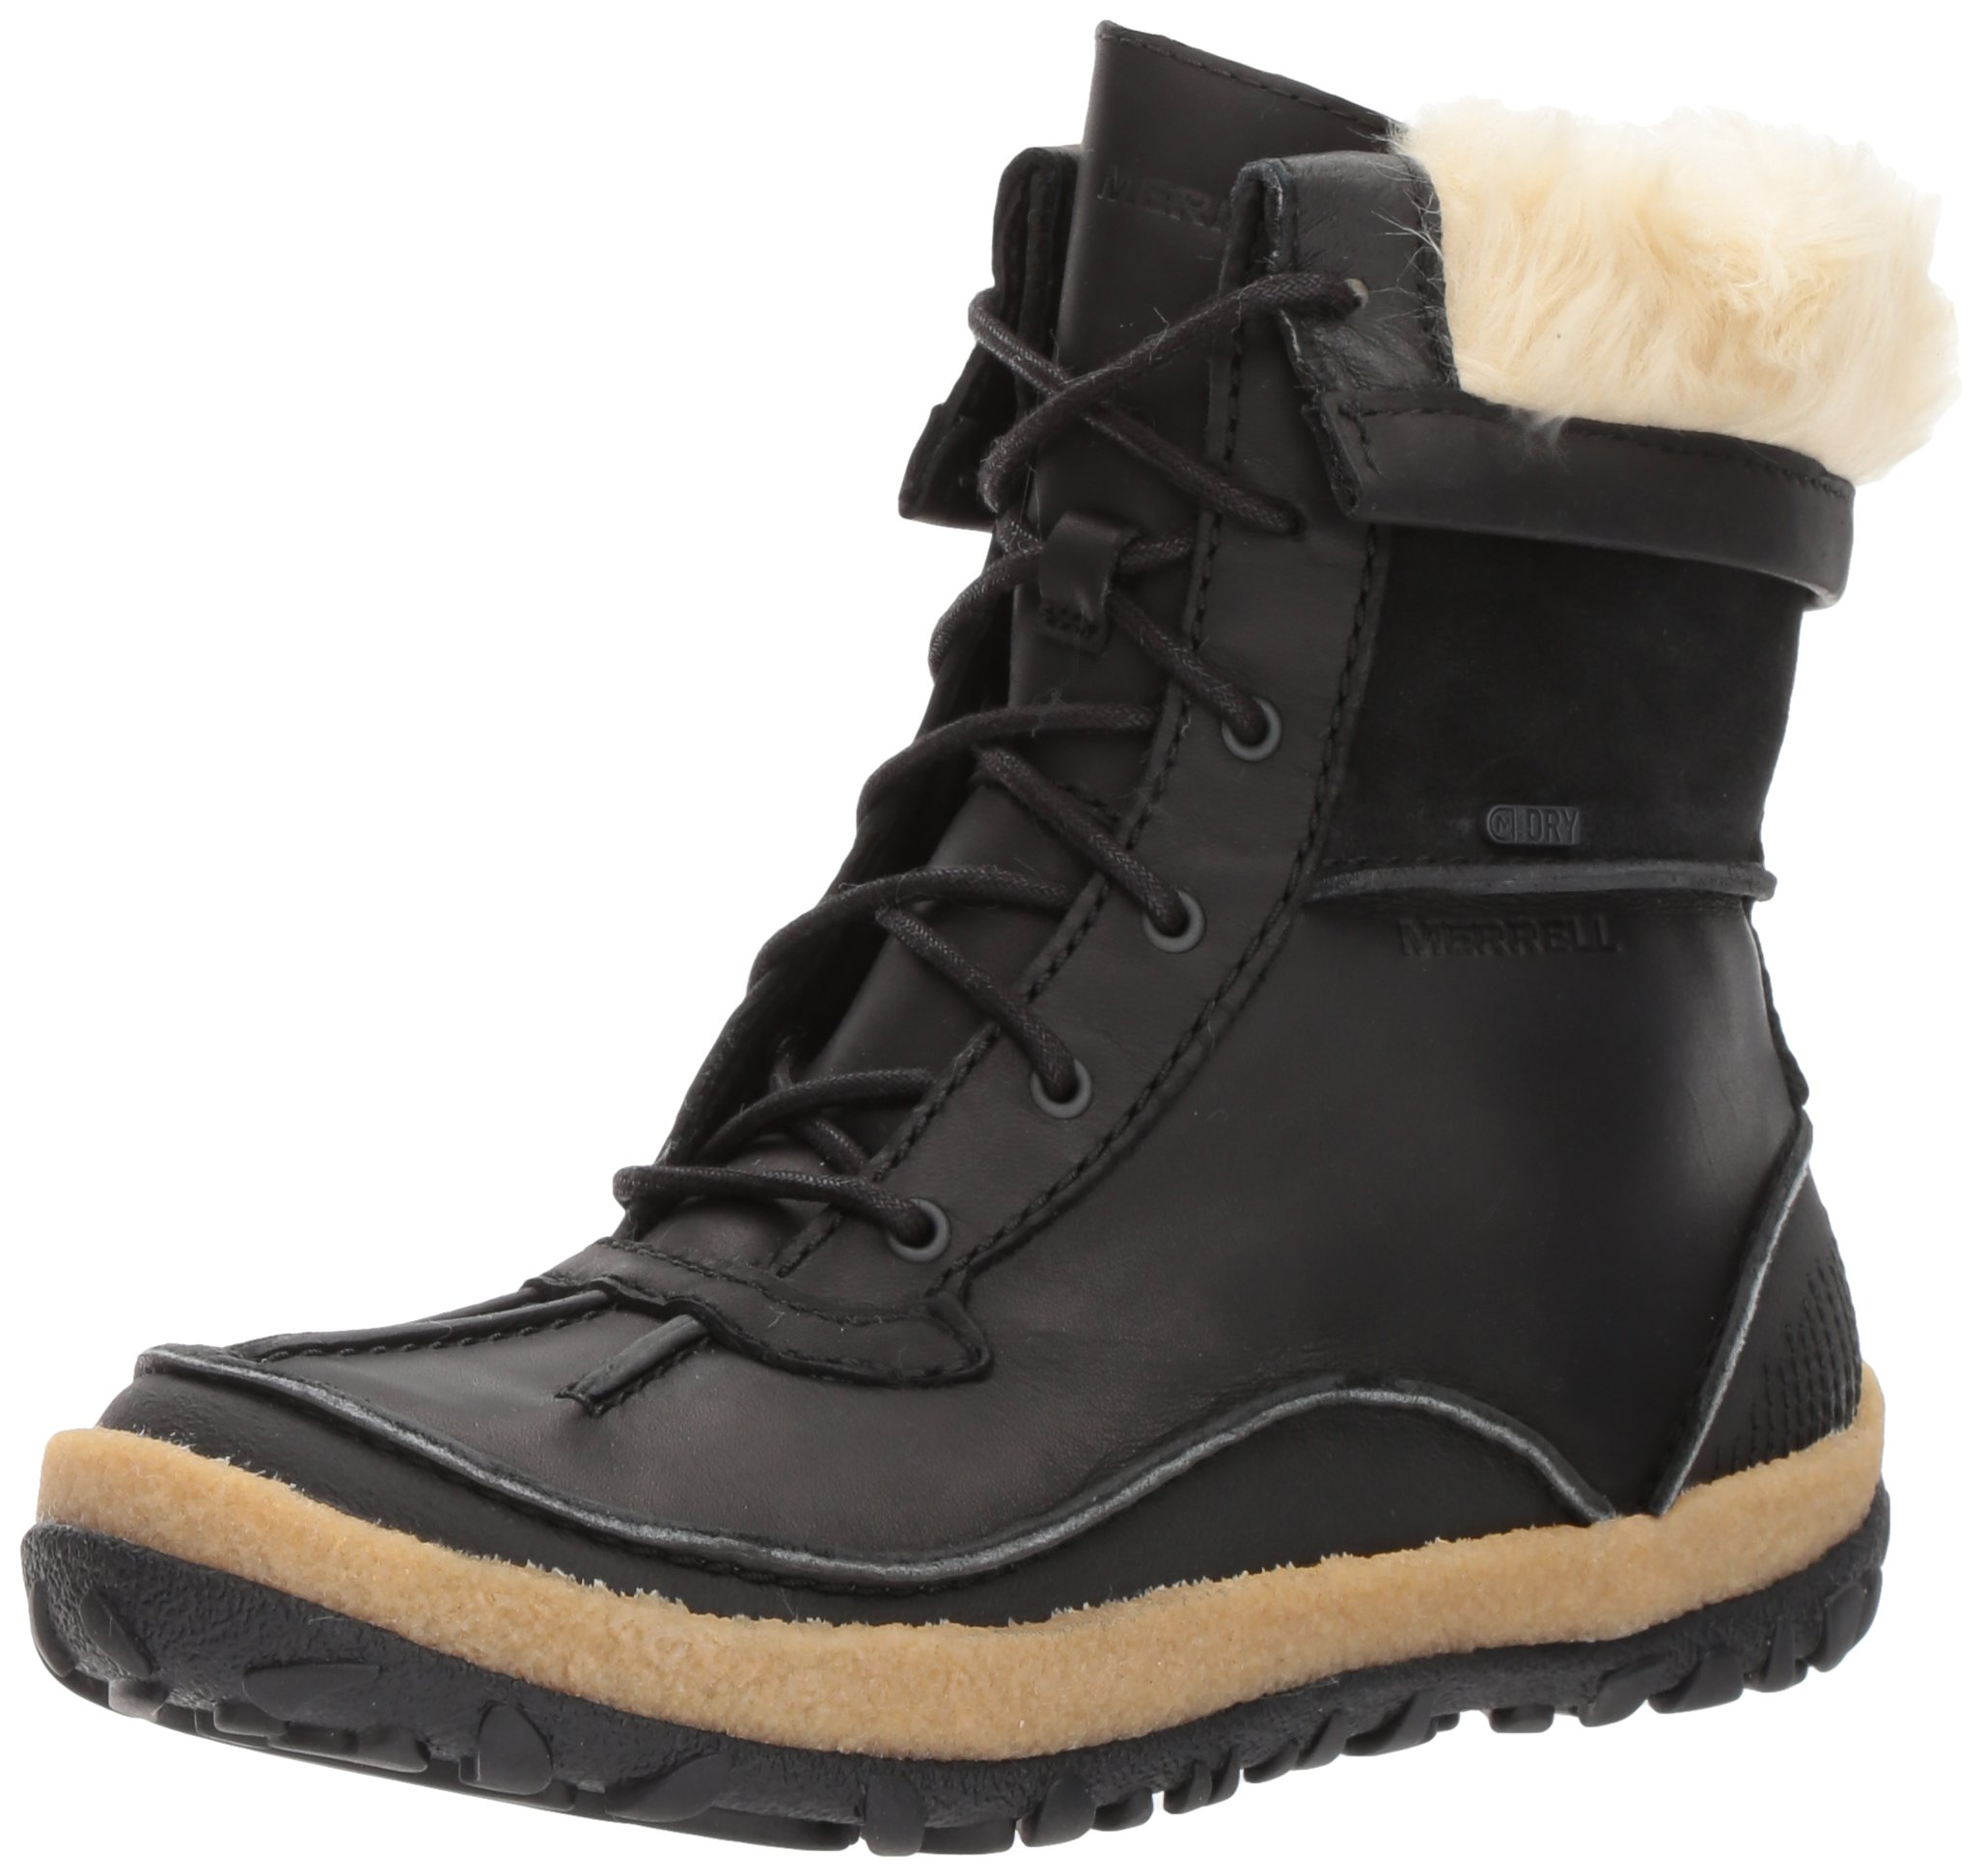 Merrell Women's Tremblant Mid Polar Waterproof Snow Boot, Black, 7.5 M US